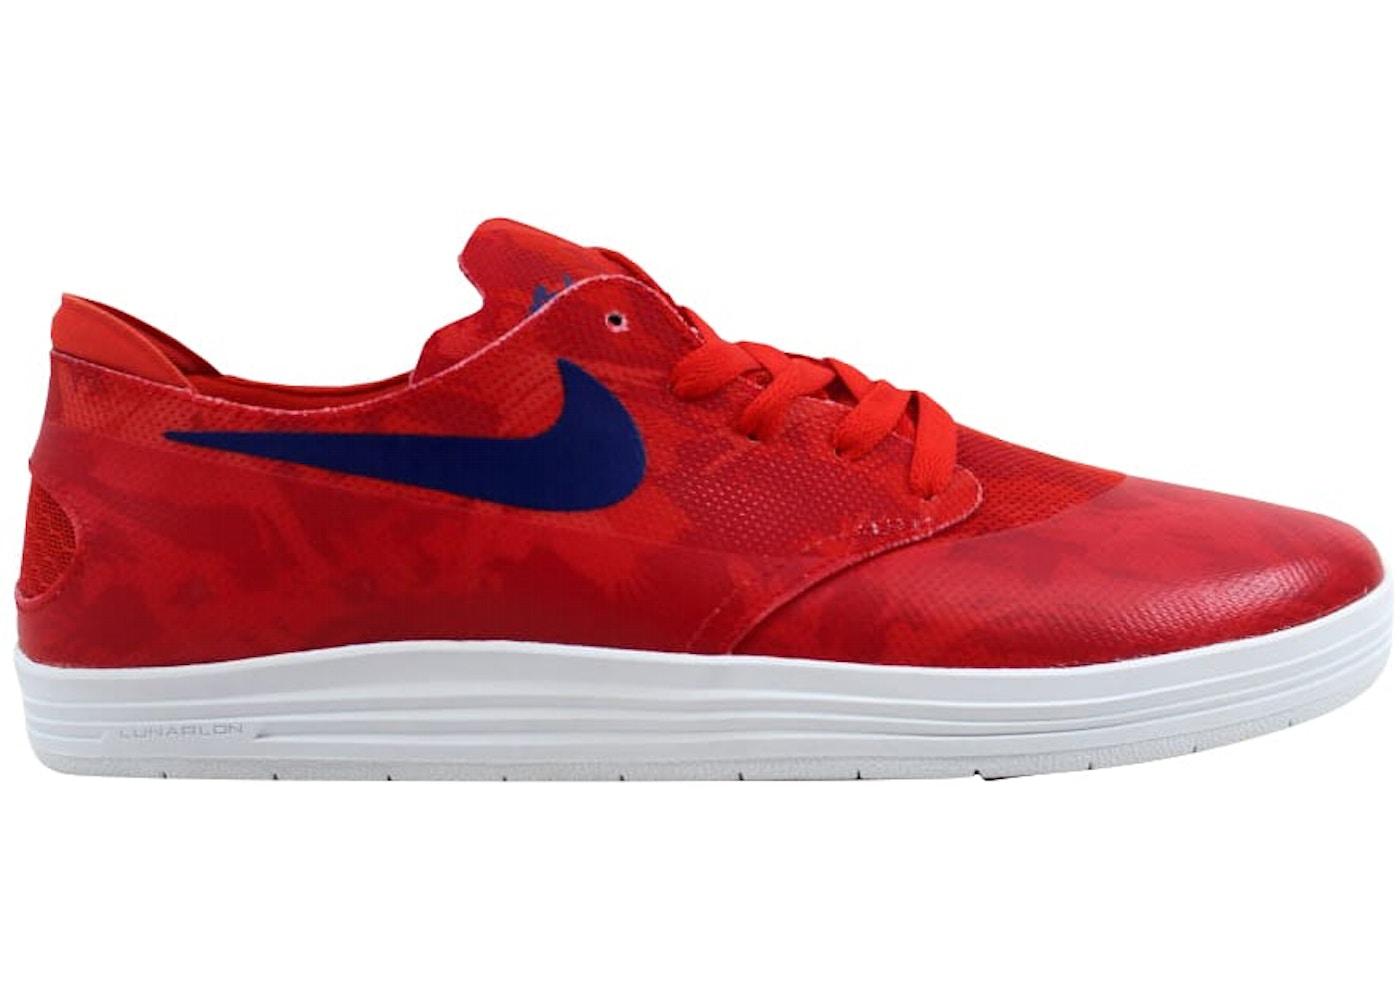 2054a0c8995e Nike Lunar Oneshot SB WC Light Crimson Deep Royal Blue - 645019-604